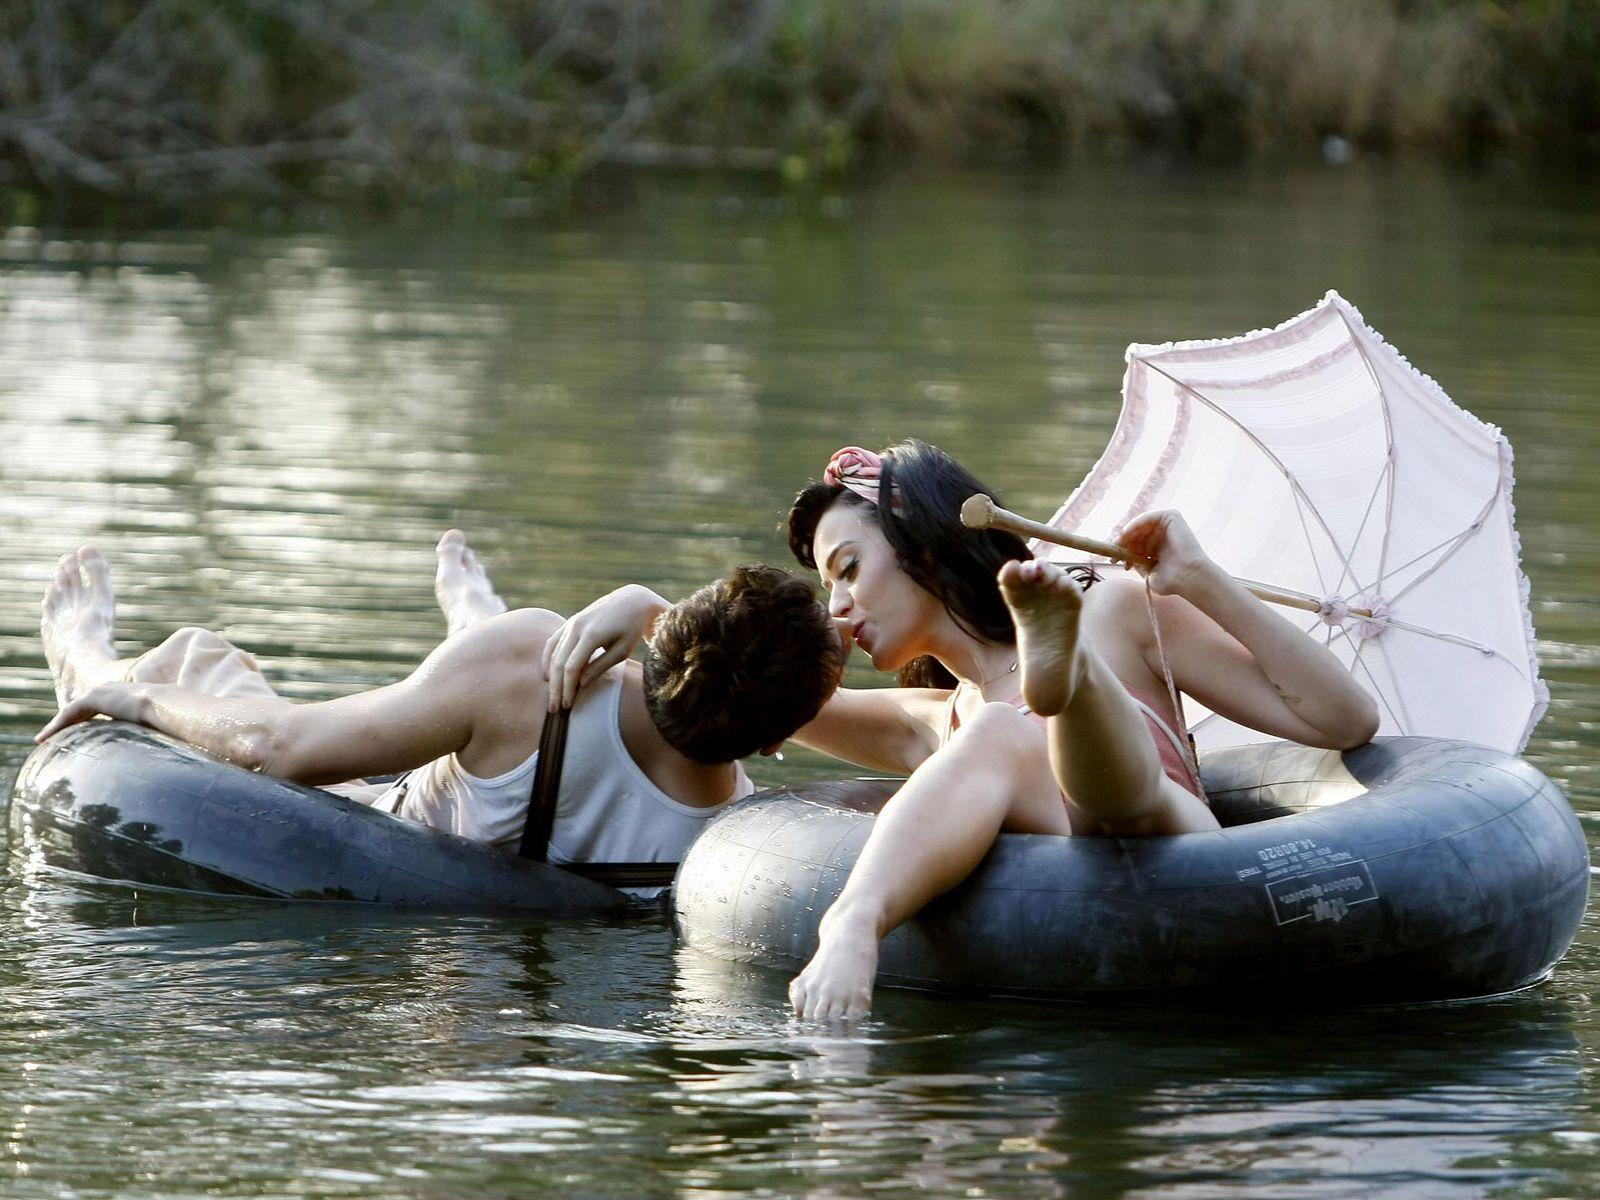 smotret-seks-na-reke